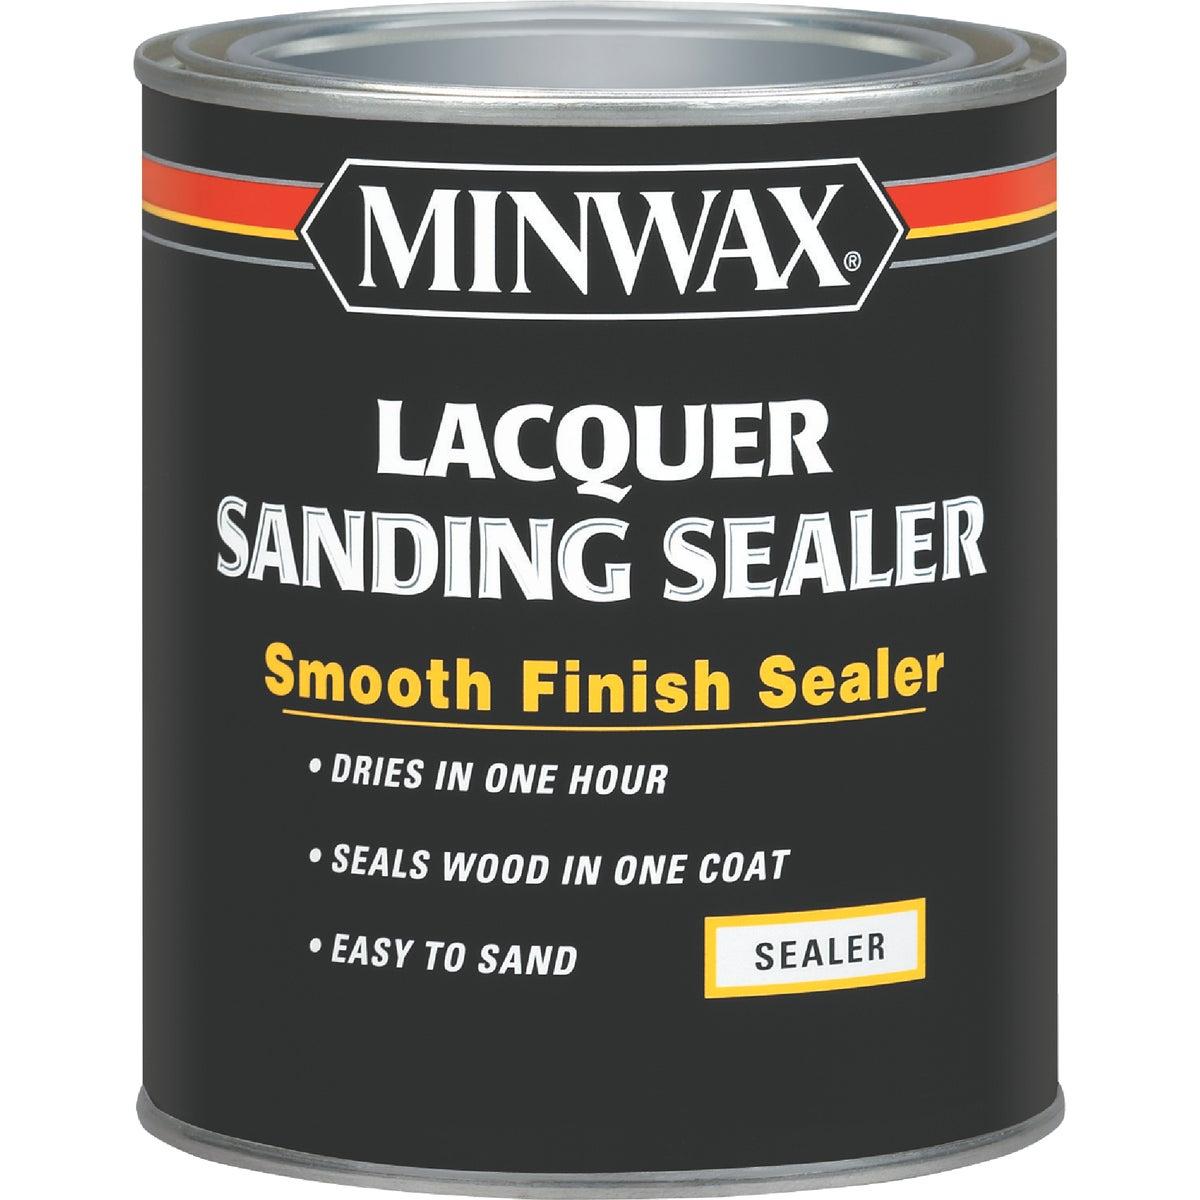 Minwax LACQUER SANDING SEALER 154000000